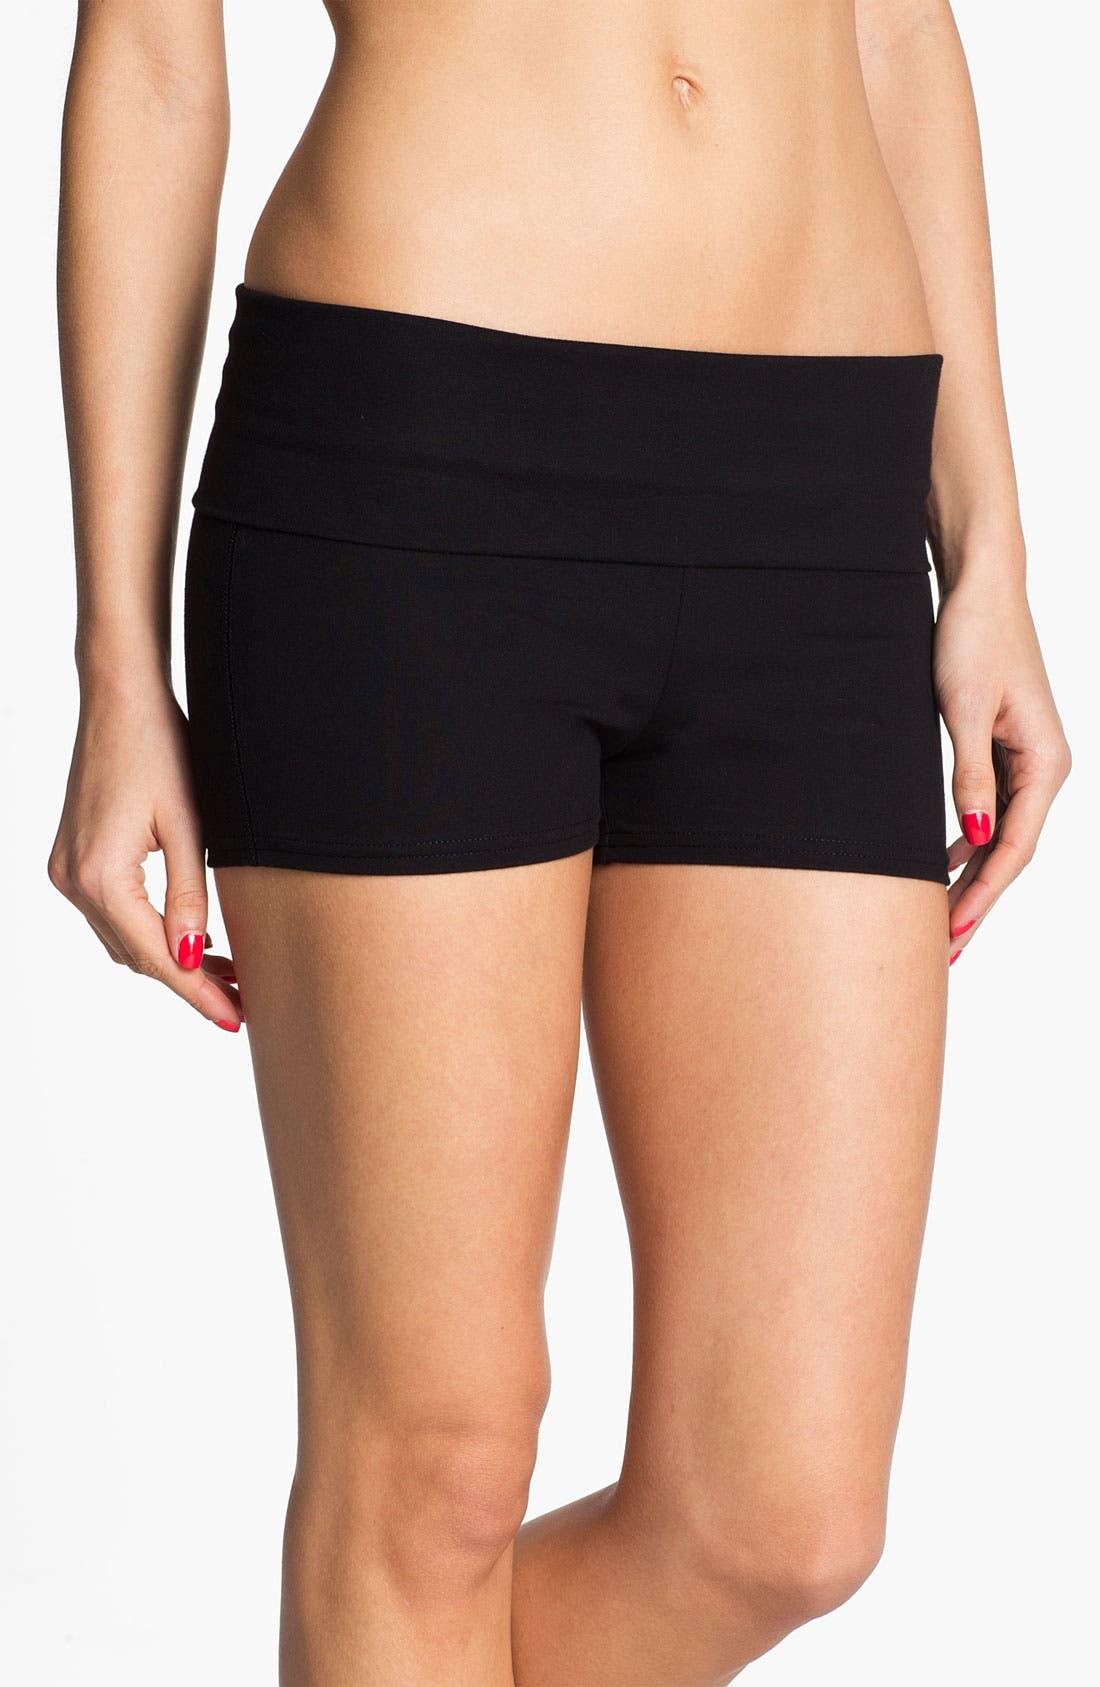 Alternate Image 1 Selected - BP. Undercover Foldover Lounge Shorts (Juniors)